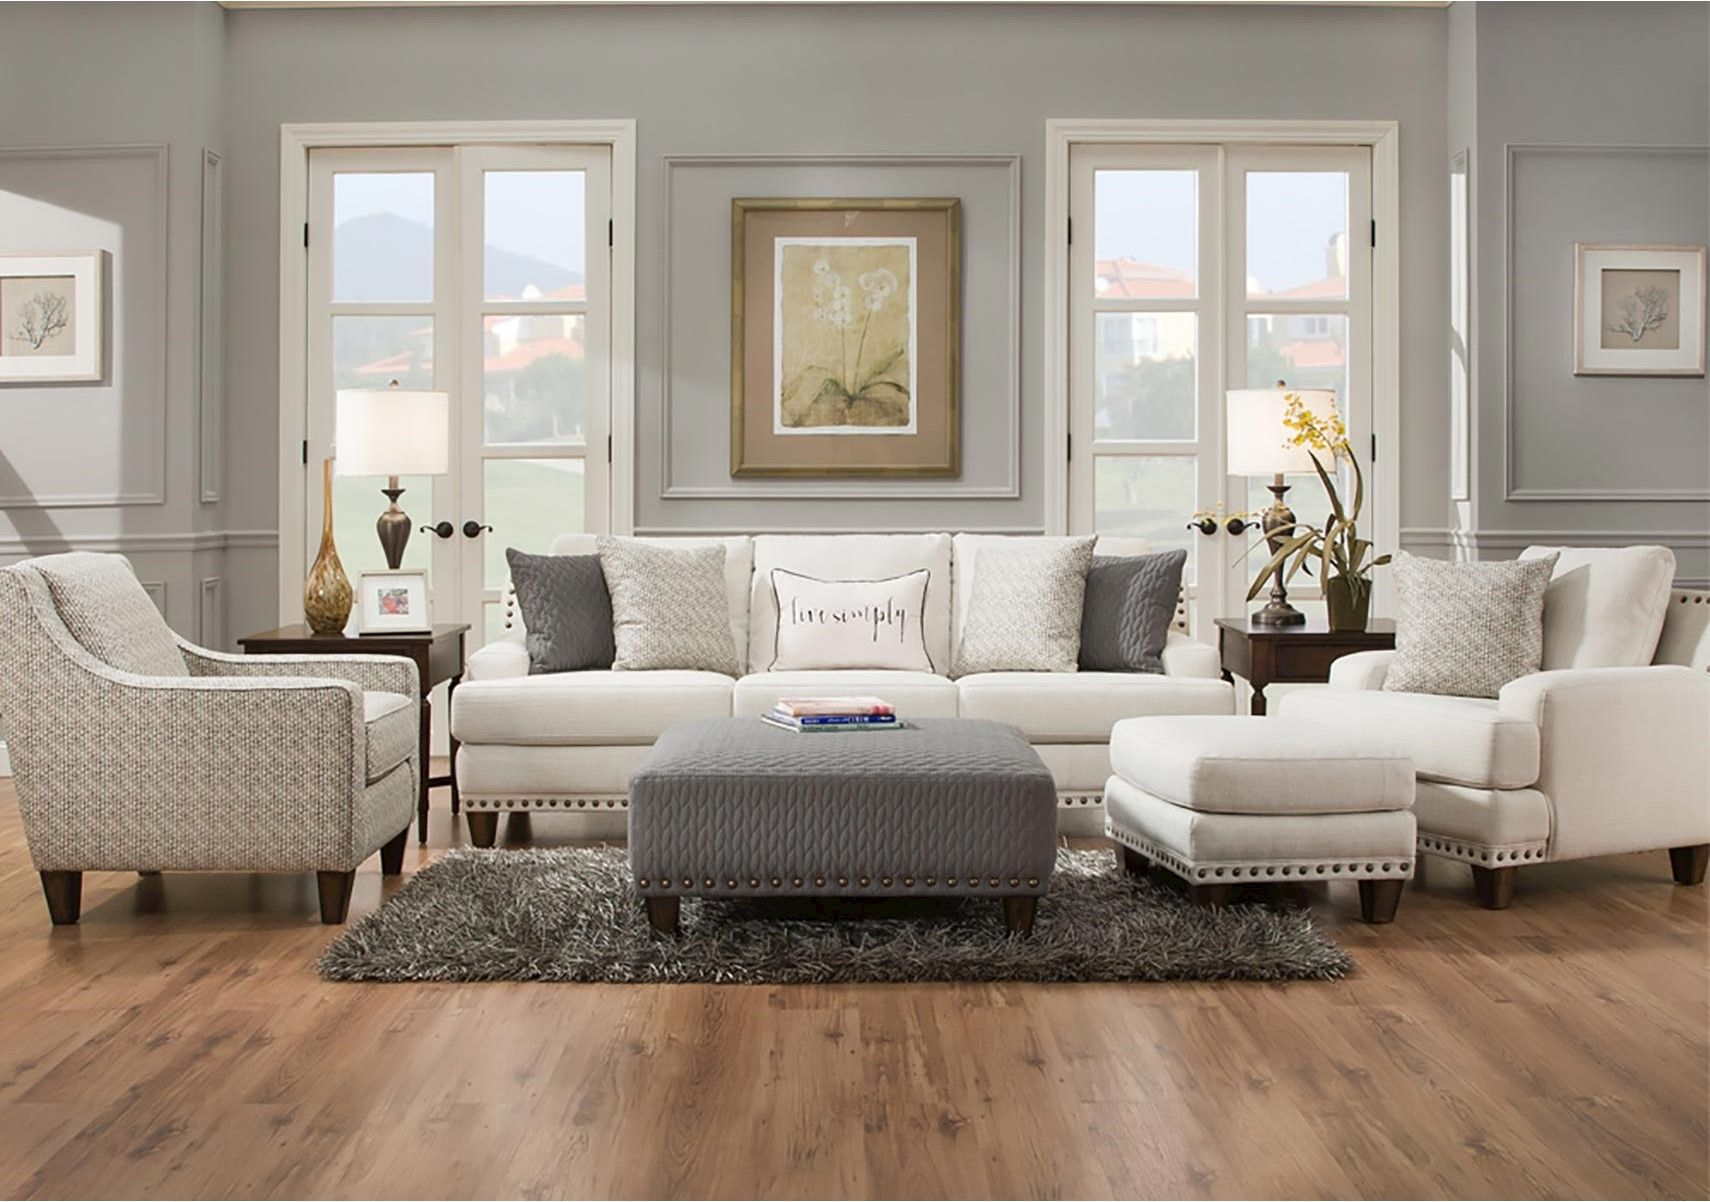 Lacks Montey 2 Pc Living Room Set Living Room Sets 5 Piece Living Room Set Country Living Room #two #piece #living #room #sets